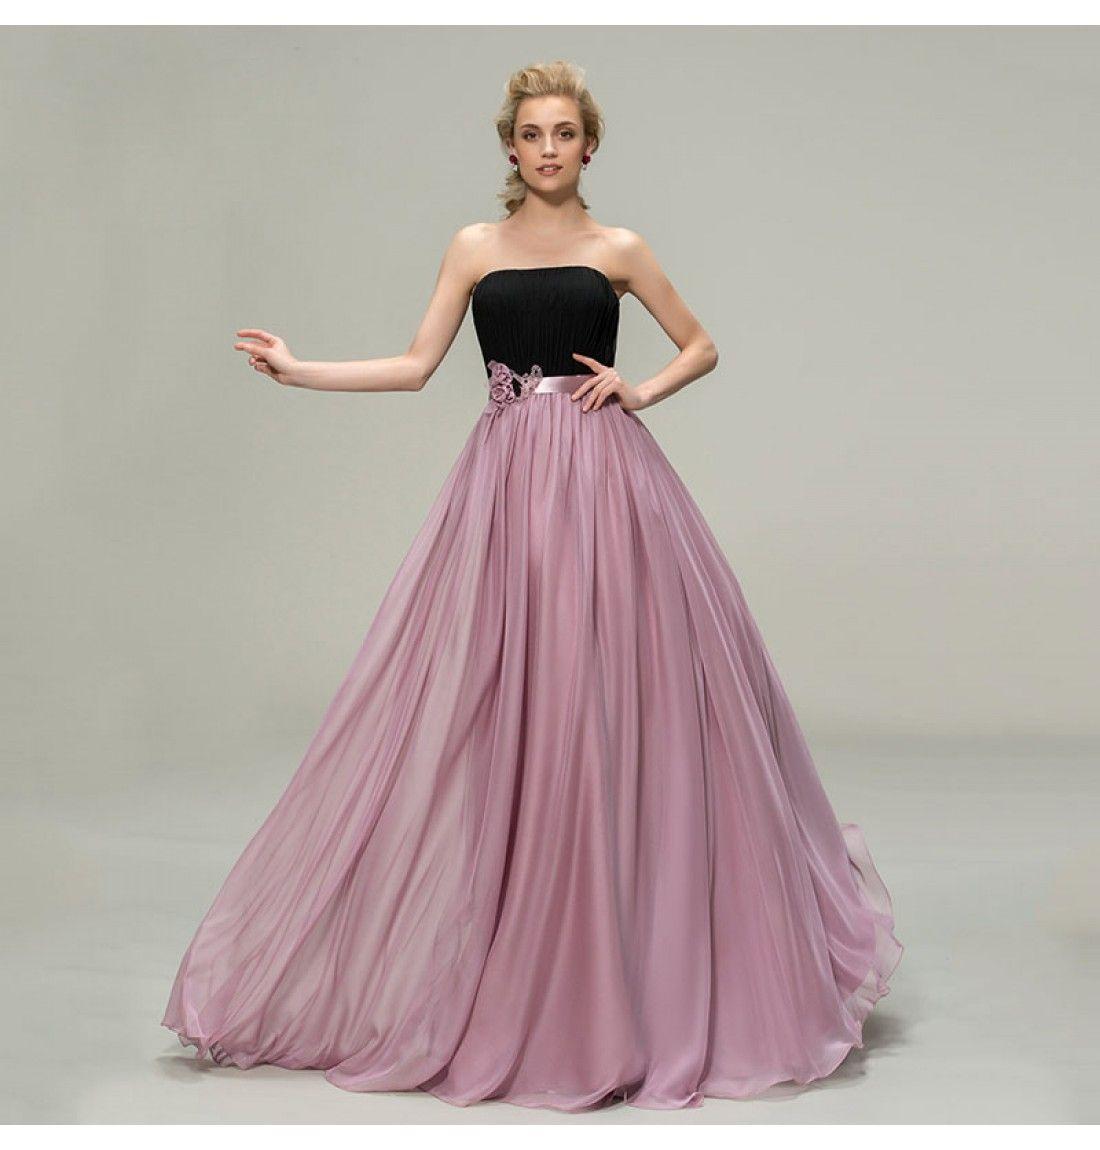 Sommer Chiffon Schwarz & Lila Brautjungfer Kleid …   Pinteres…